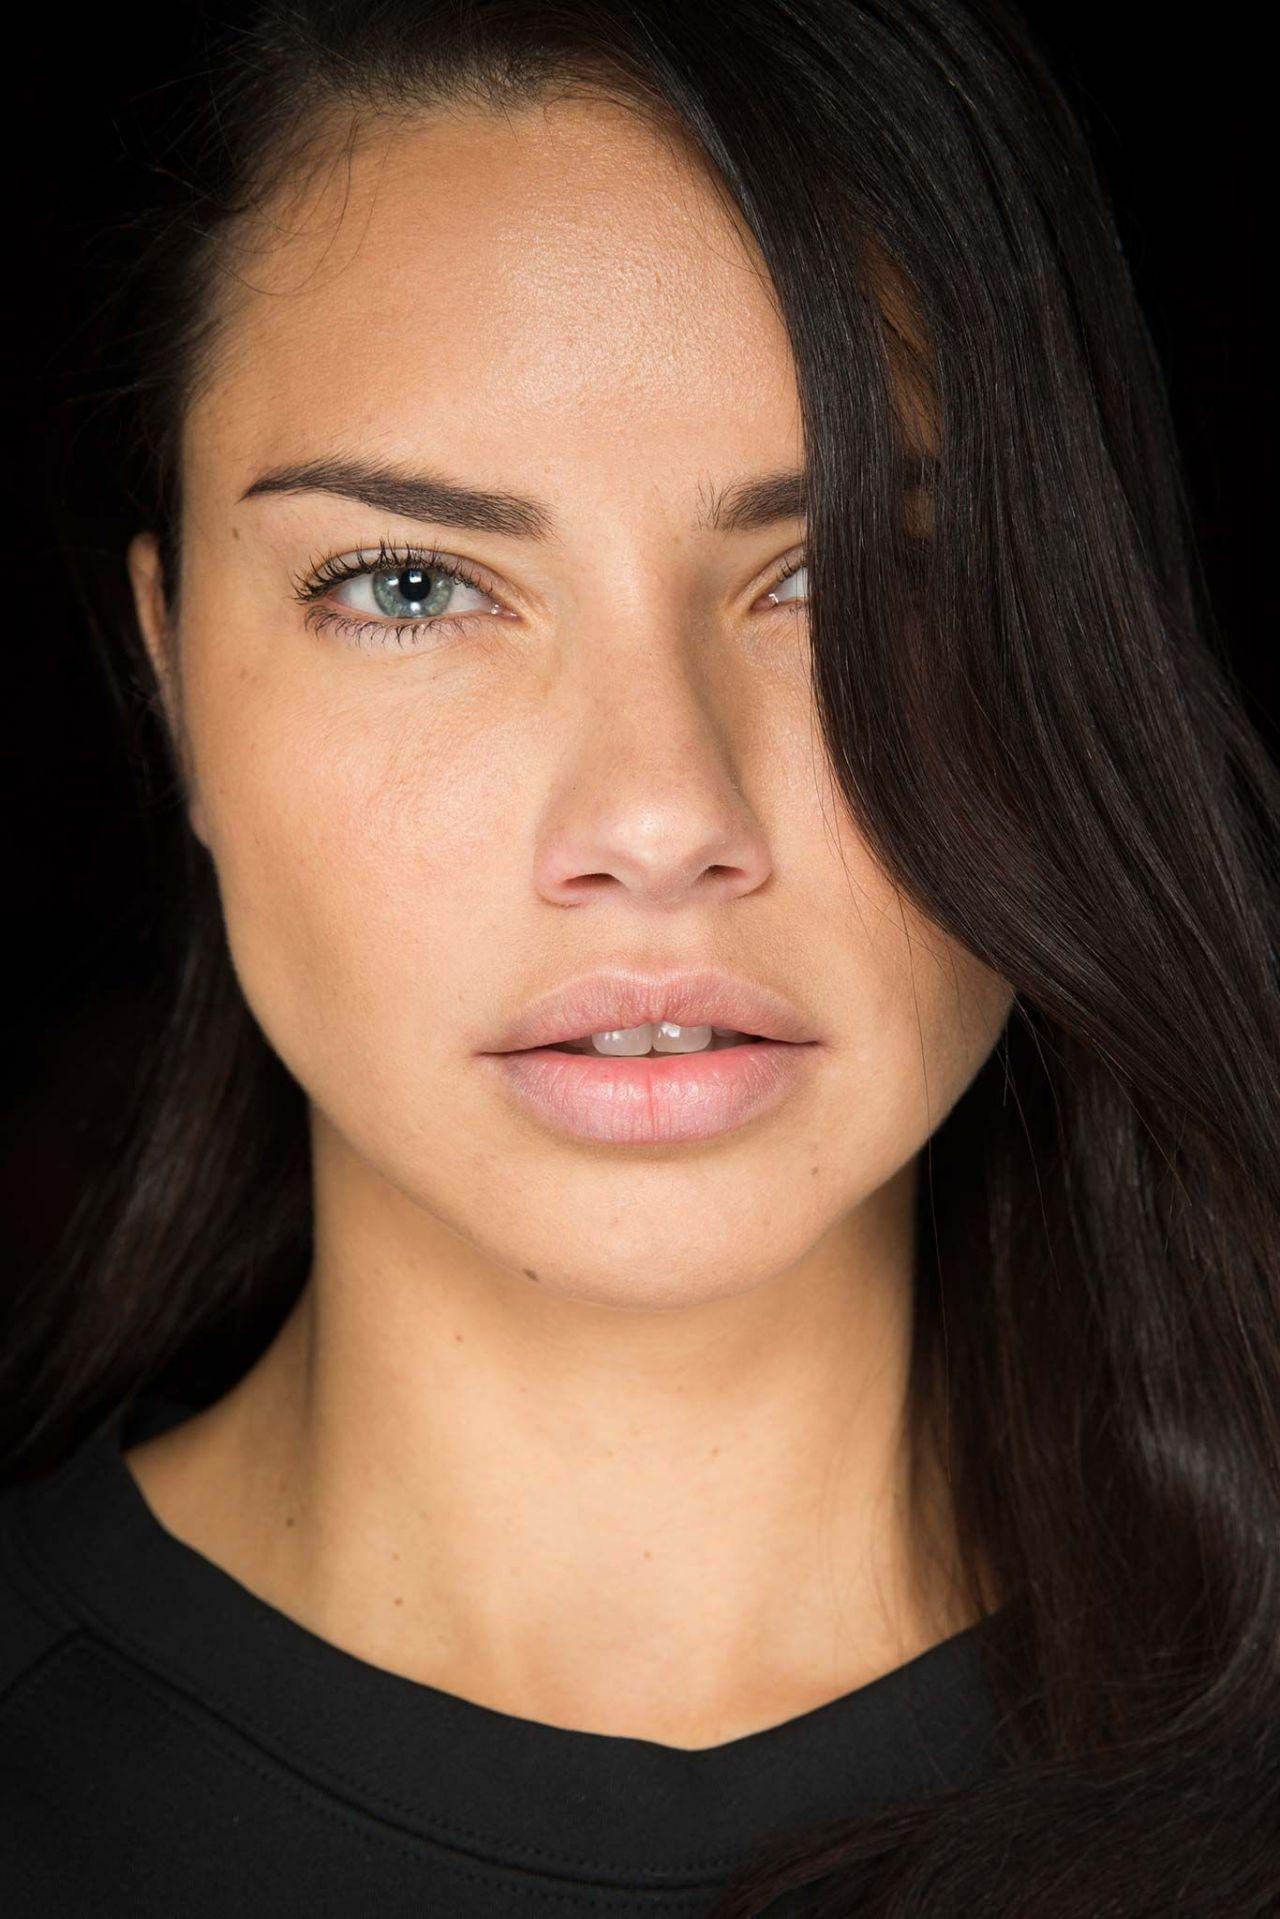 Adriana Lima - IWC Schaffhausen For the Love of Cinema